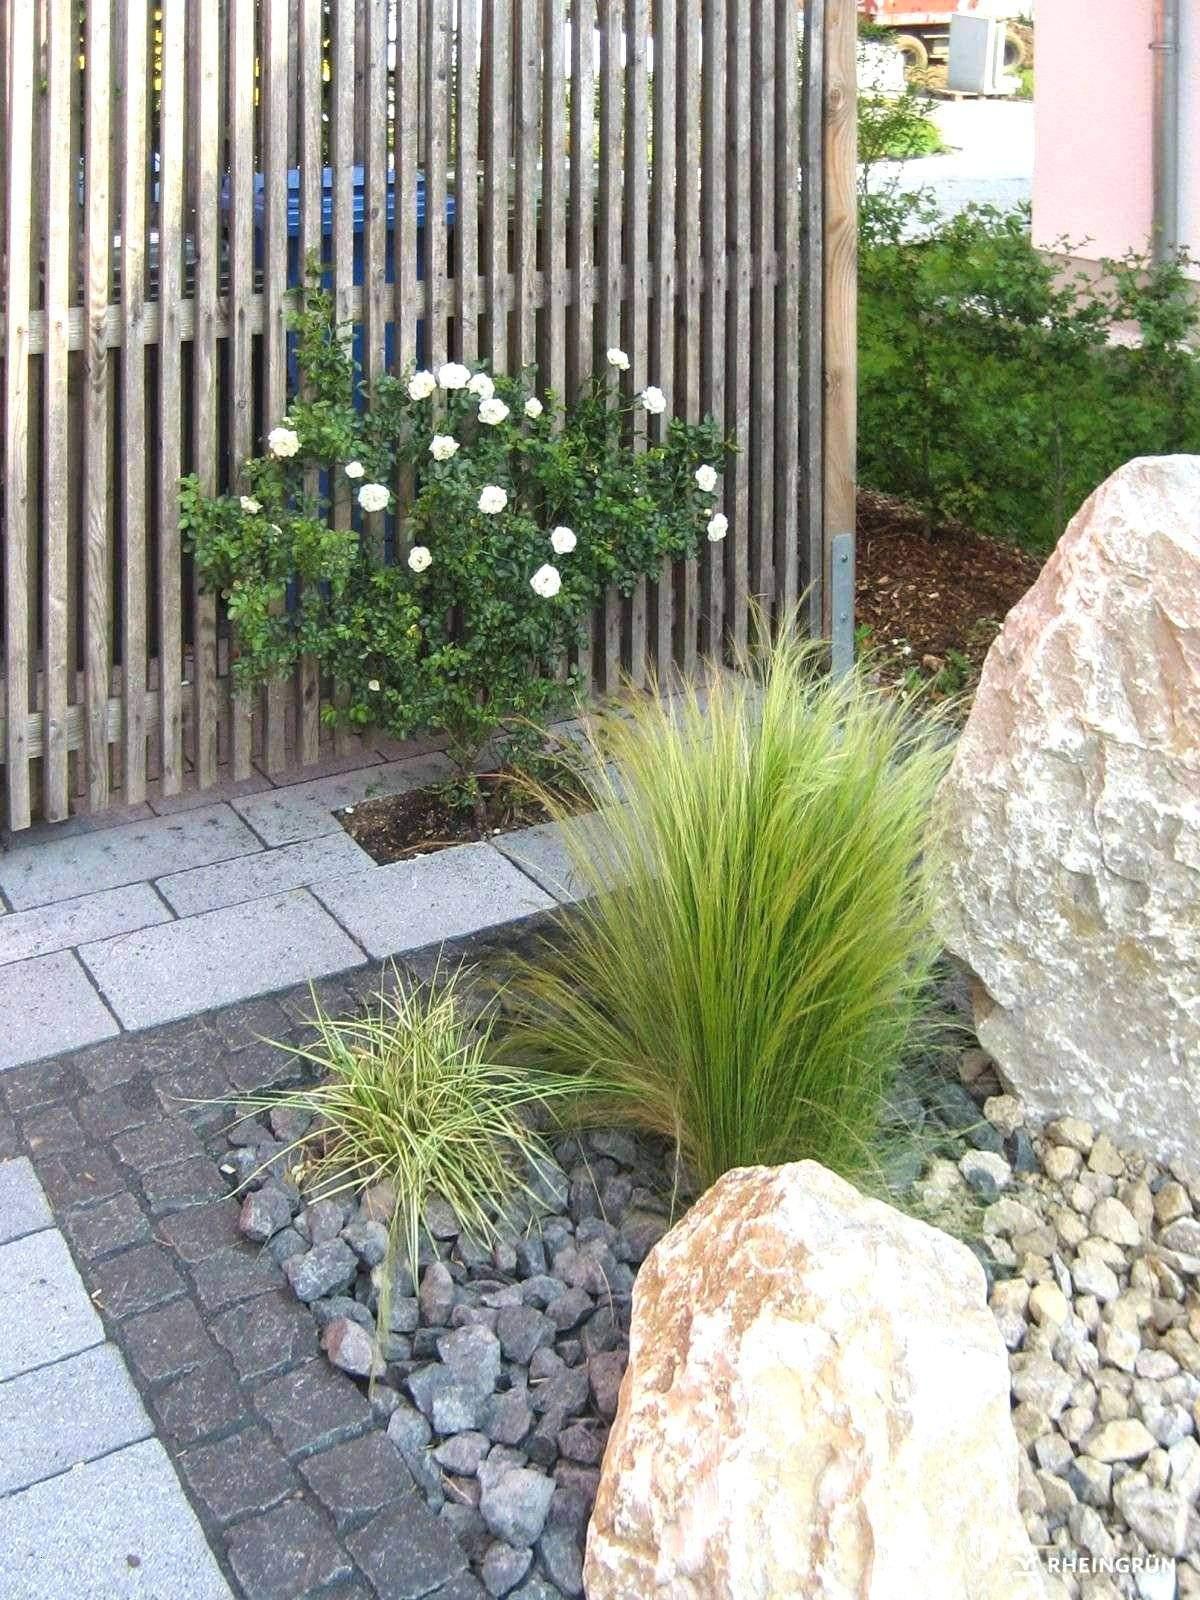 pflanze wohnzimmer inspirierend awesome pflanzen wohnzimmer ideen concept of pflanze wohnzimmer